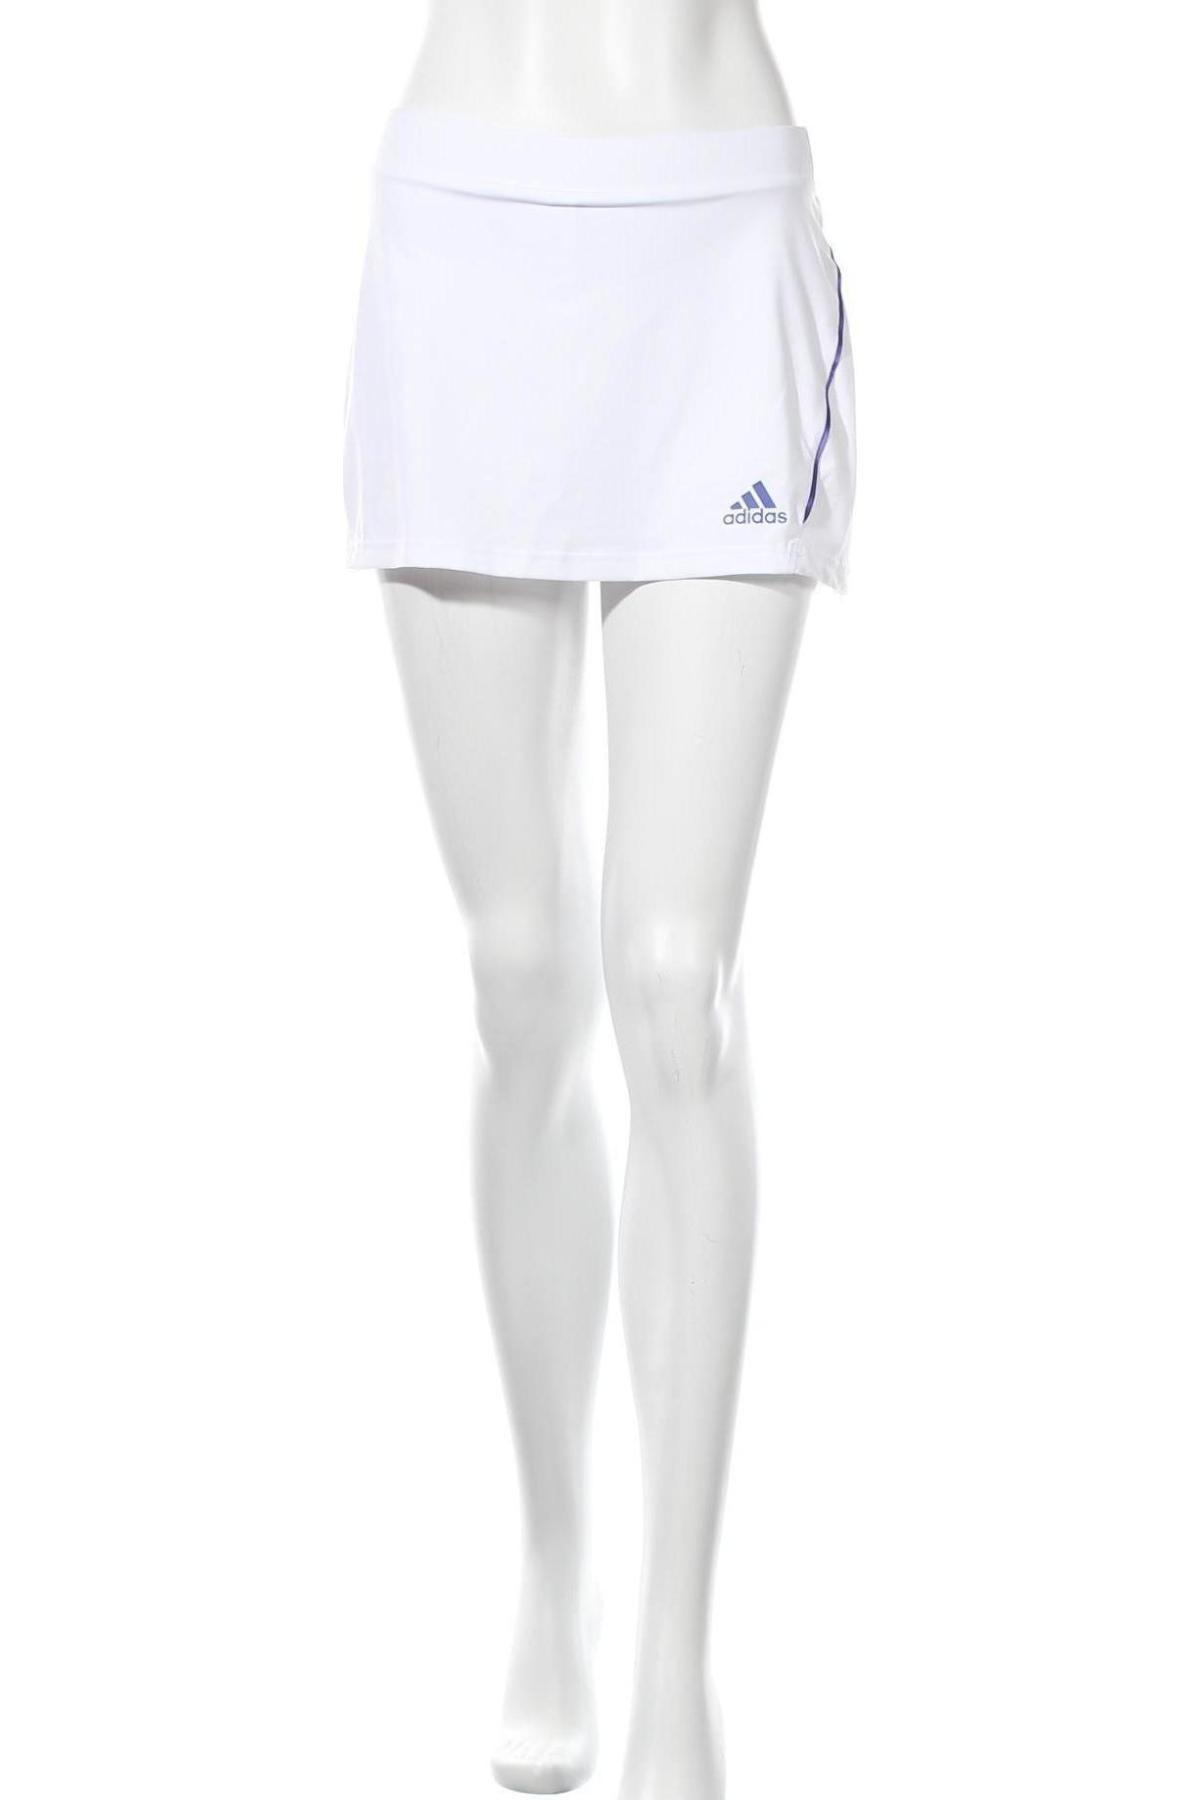 Пола - панталон Adidas, Размер XS, Цвят Бял, 82% полиестер, 18% еластан, Цена 23,70лв.